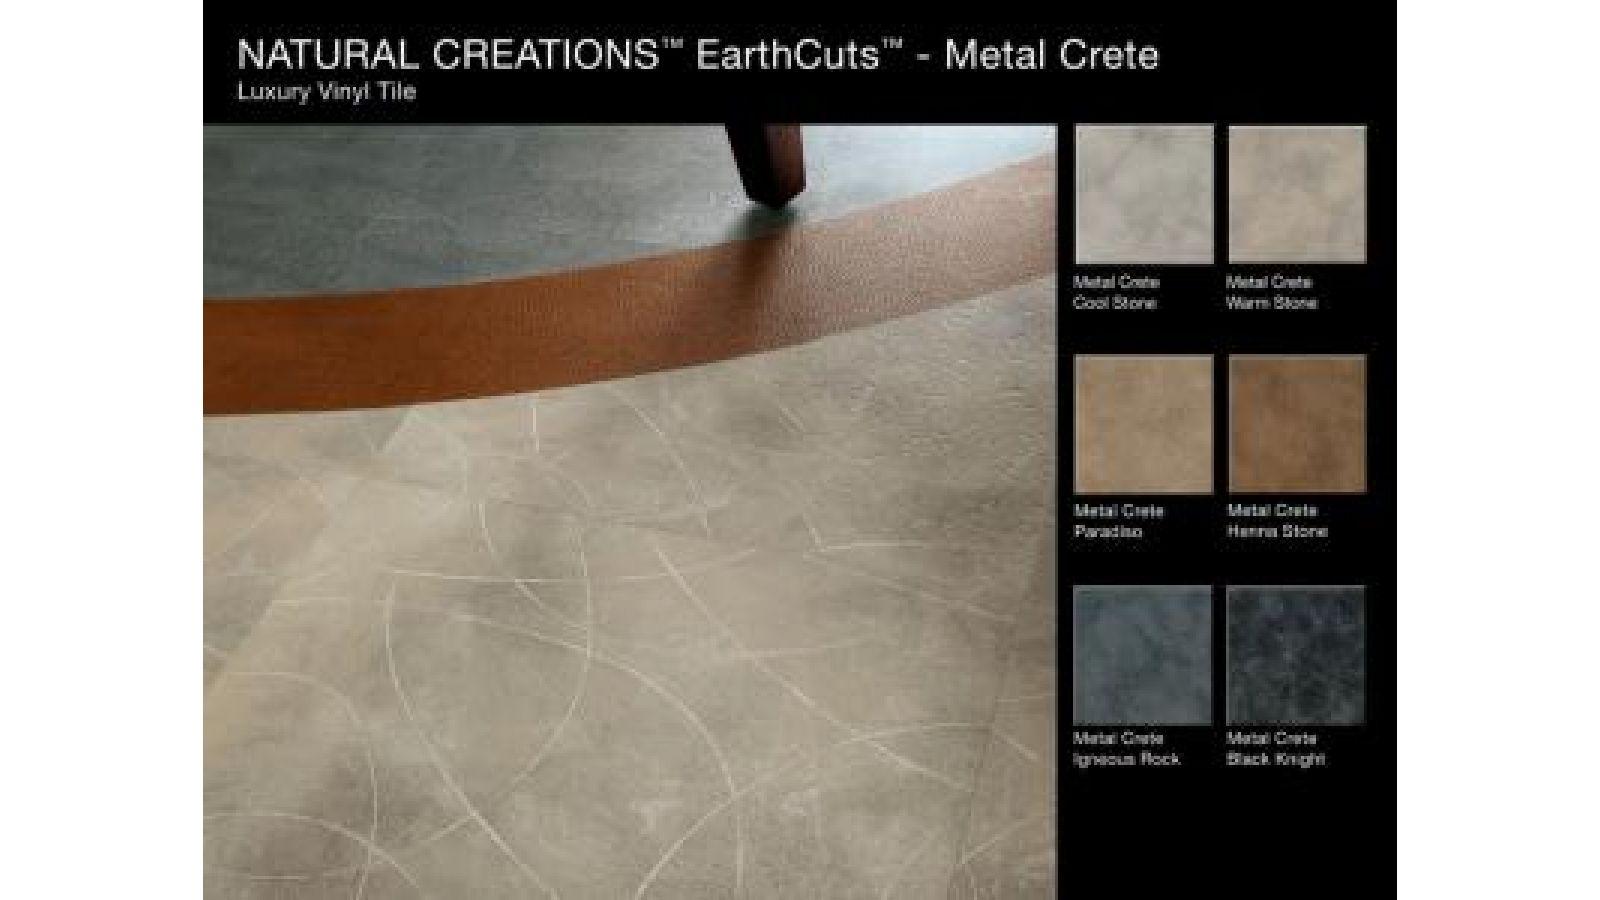 NaturalCreations MetalCrete